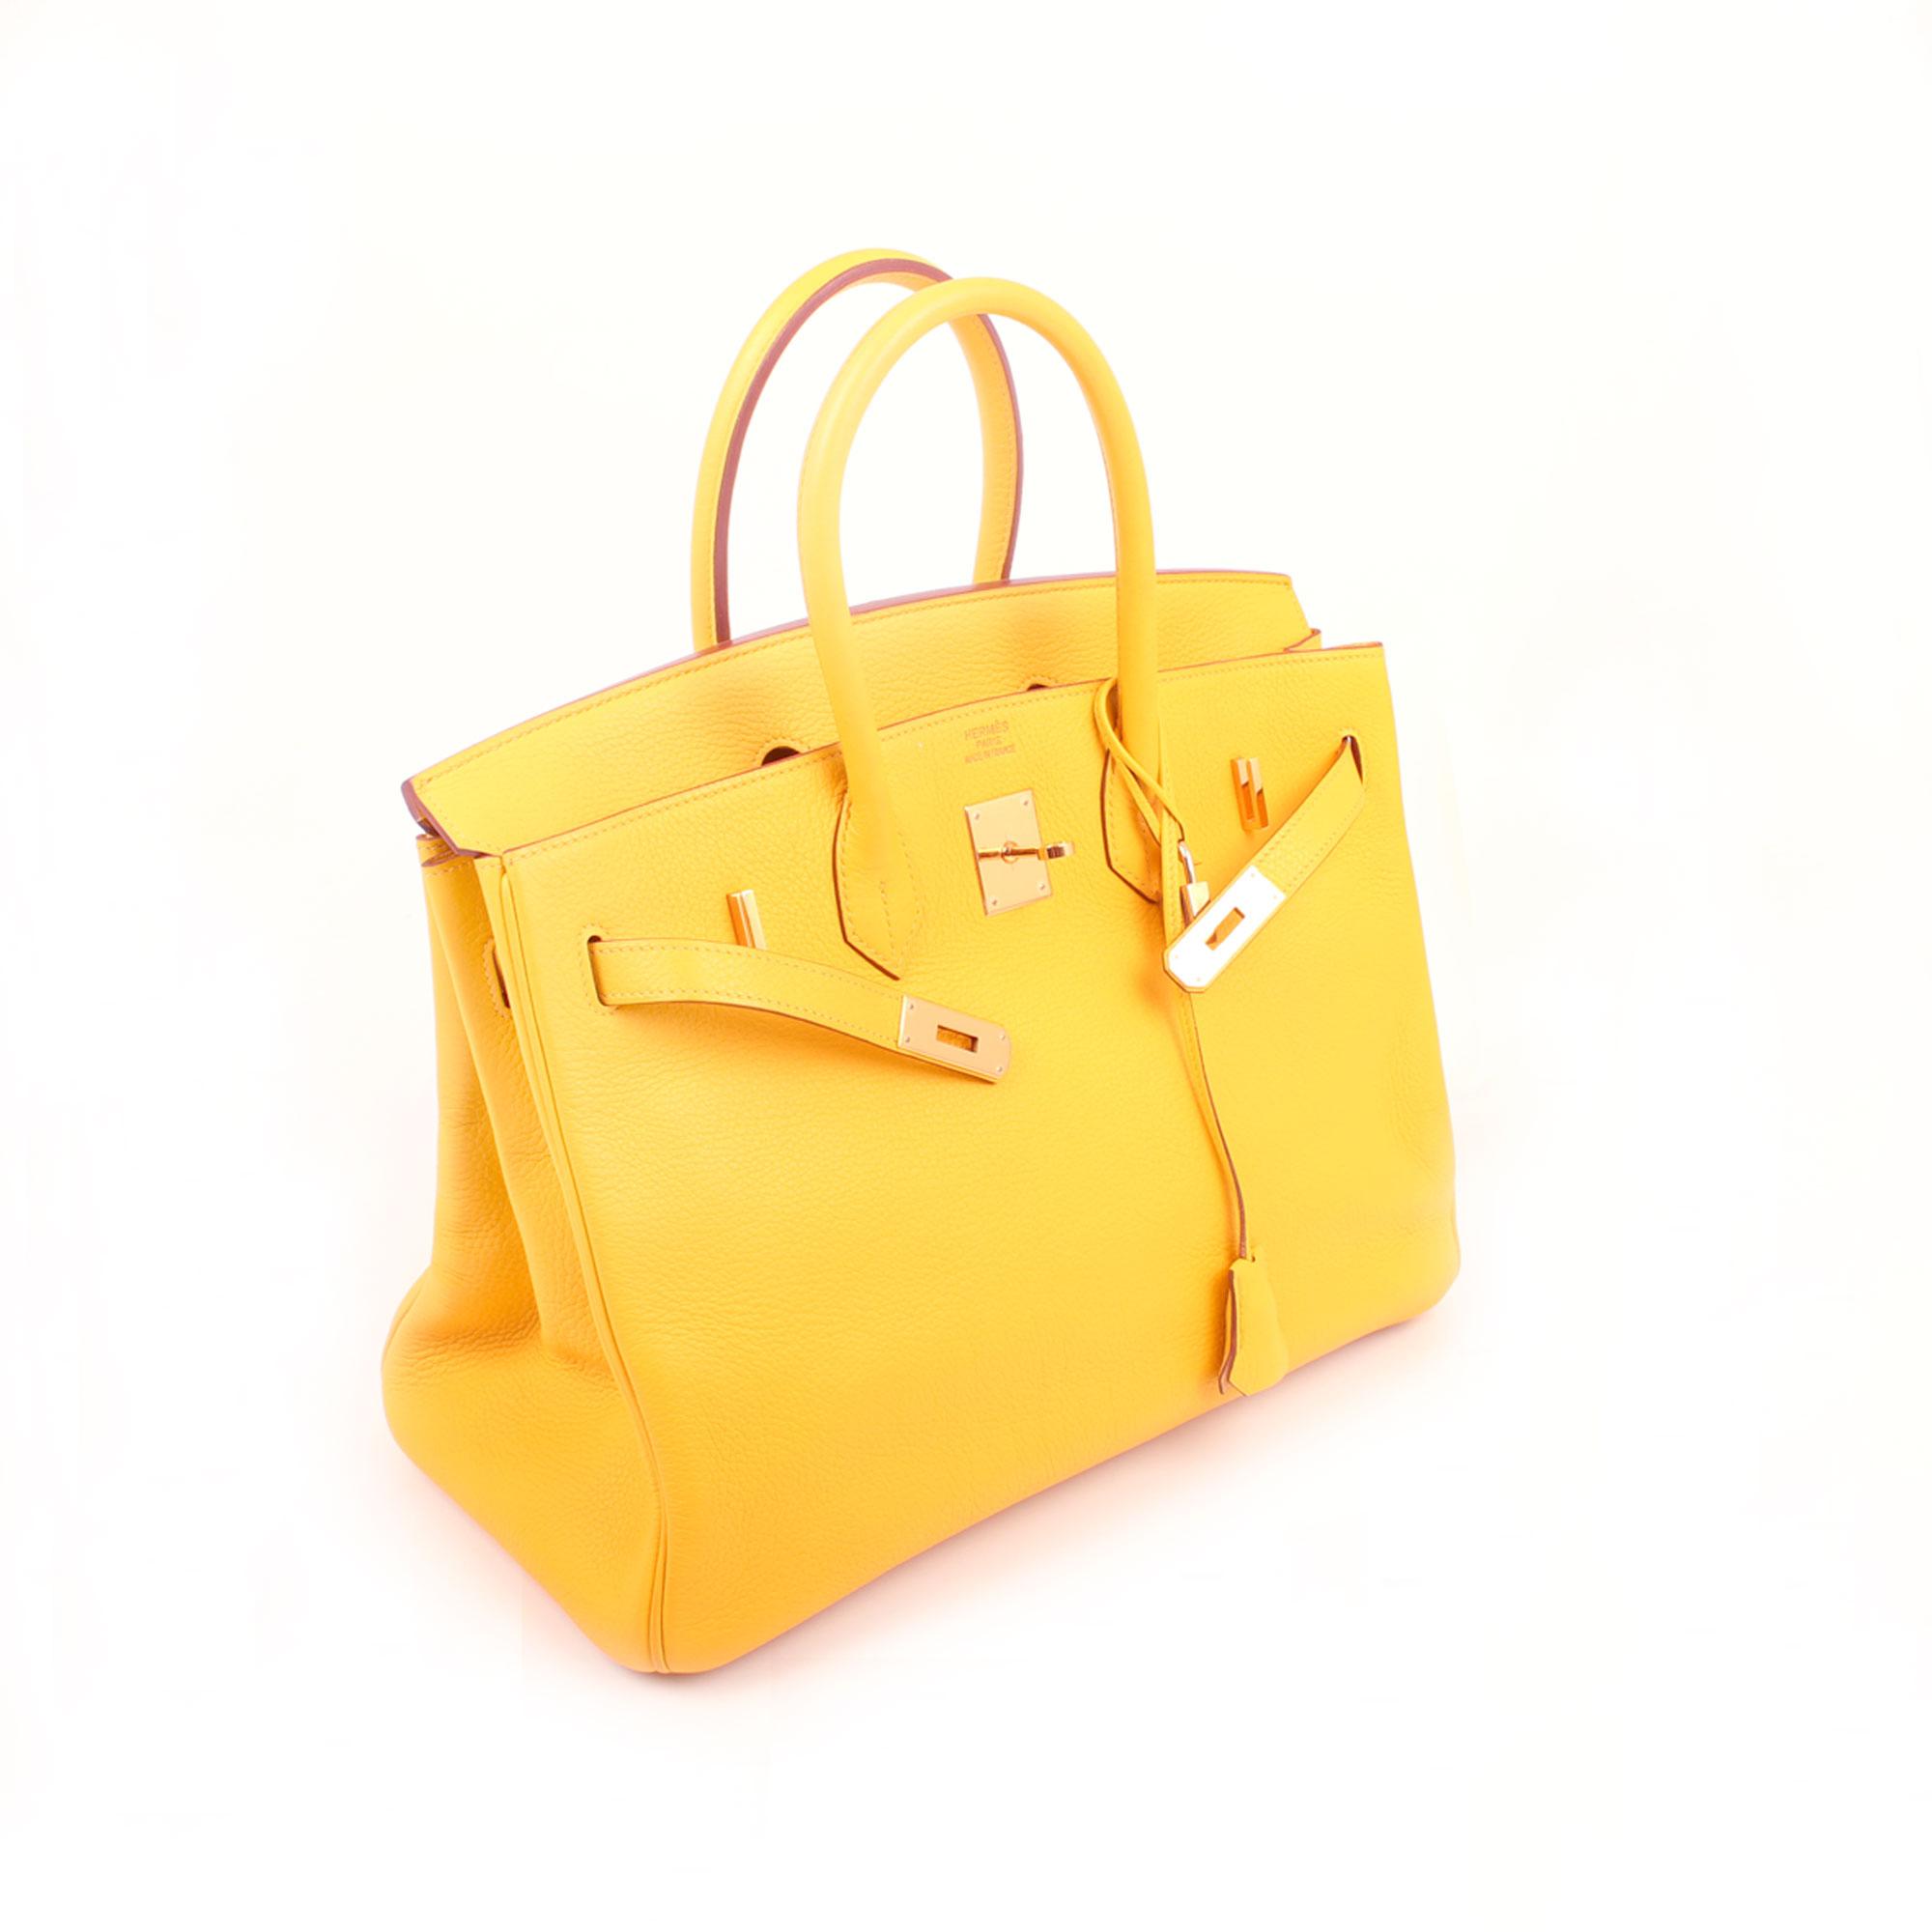 Imagen general del bolso hermes birkin 35 jaune piel togo